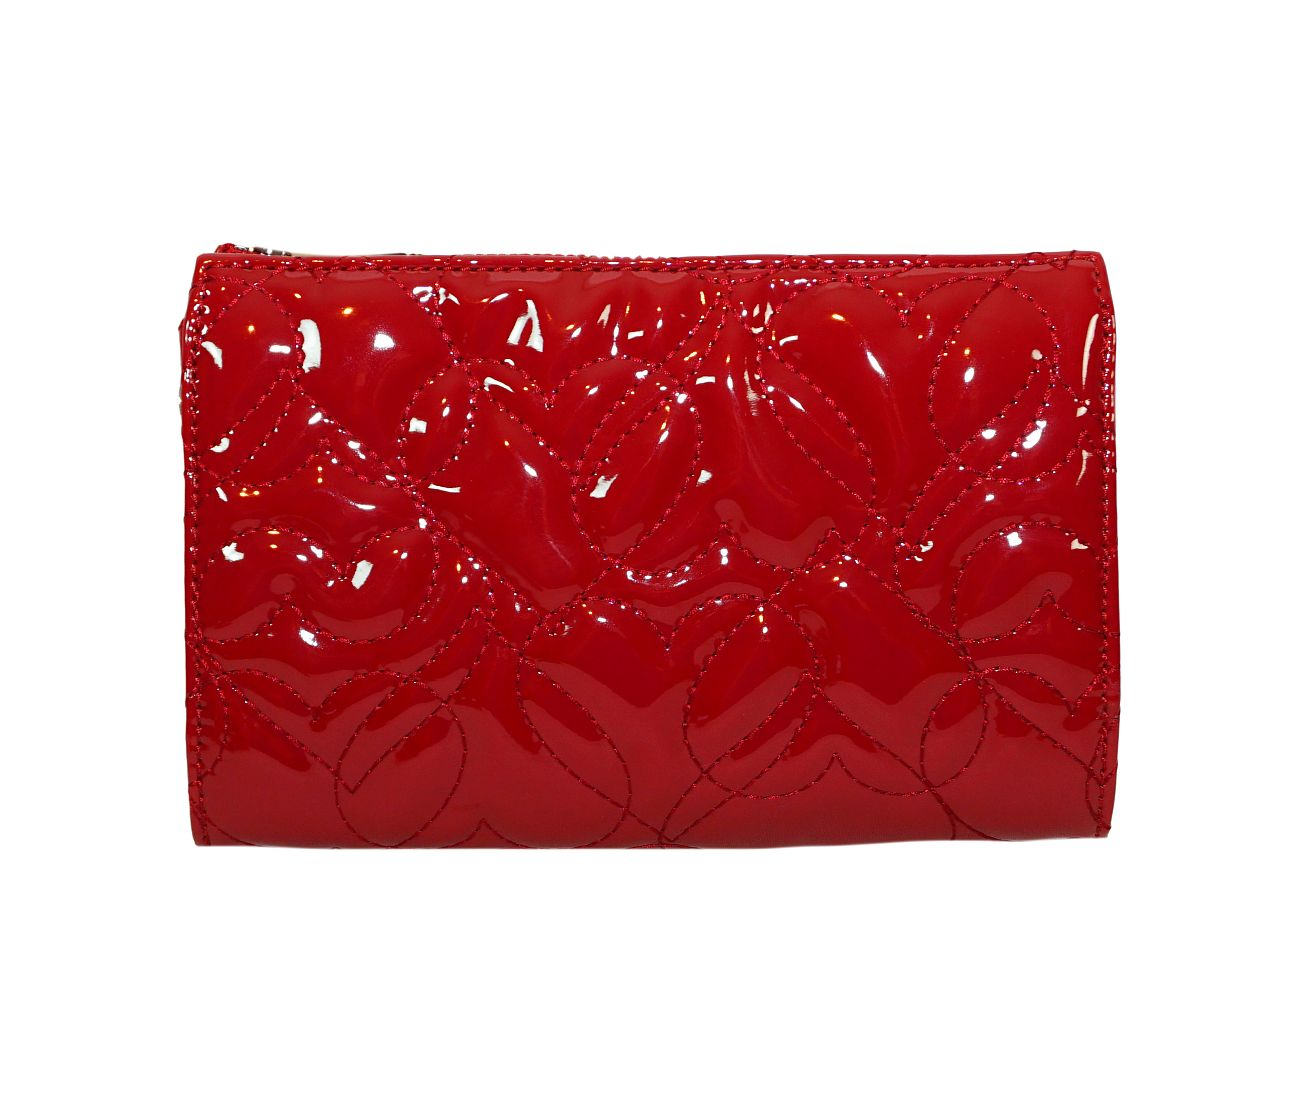 Armani Jeans Tasche Handtasche f. Damen 928582 6A752 00176 Bordeaux HW16-AJn